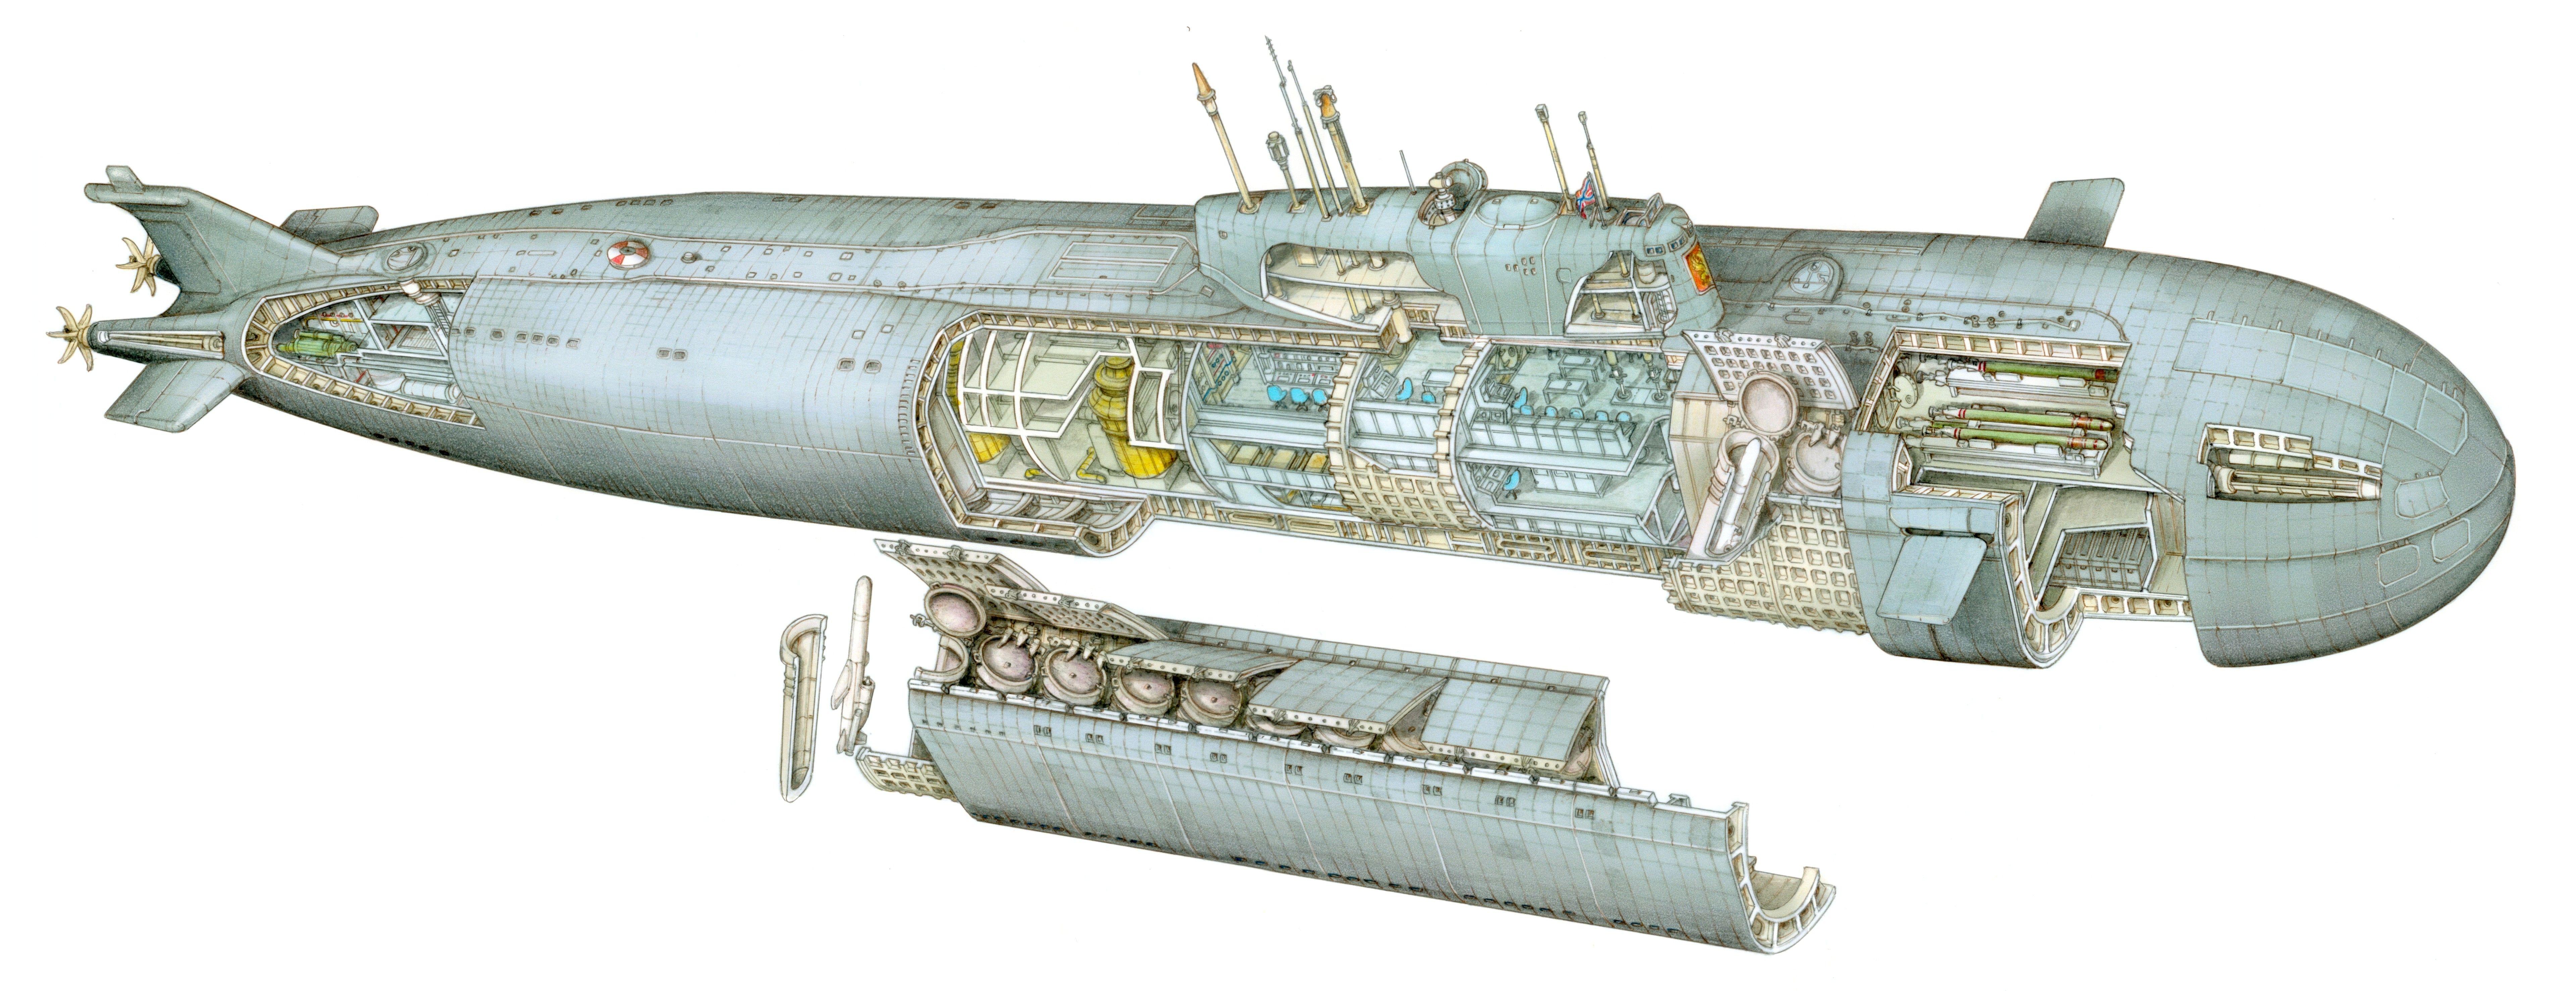 kursk nuclear submarine pinteres. Black Bedroom Furniture Sets. Home Design Ideas